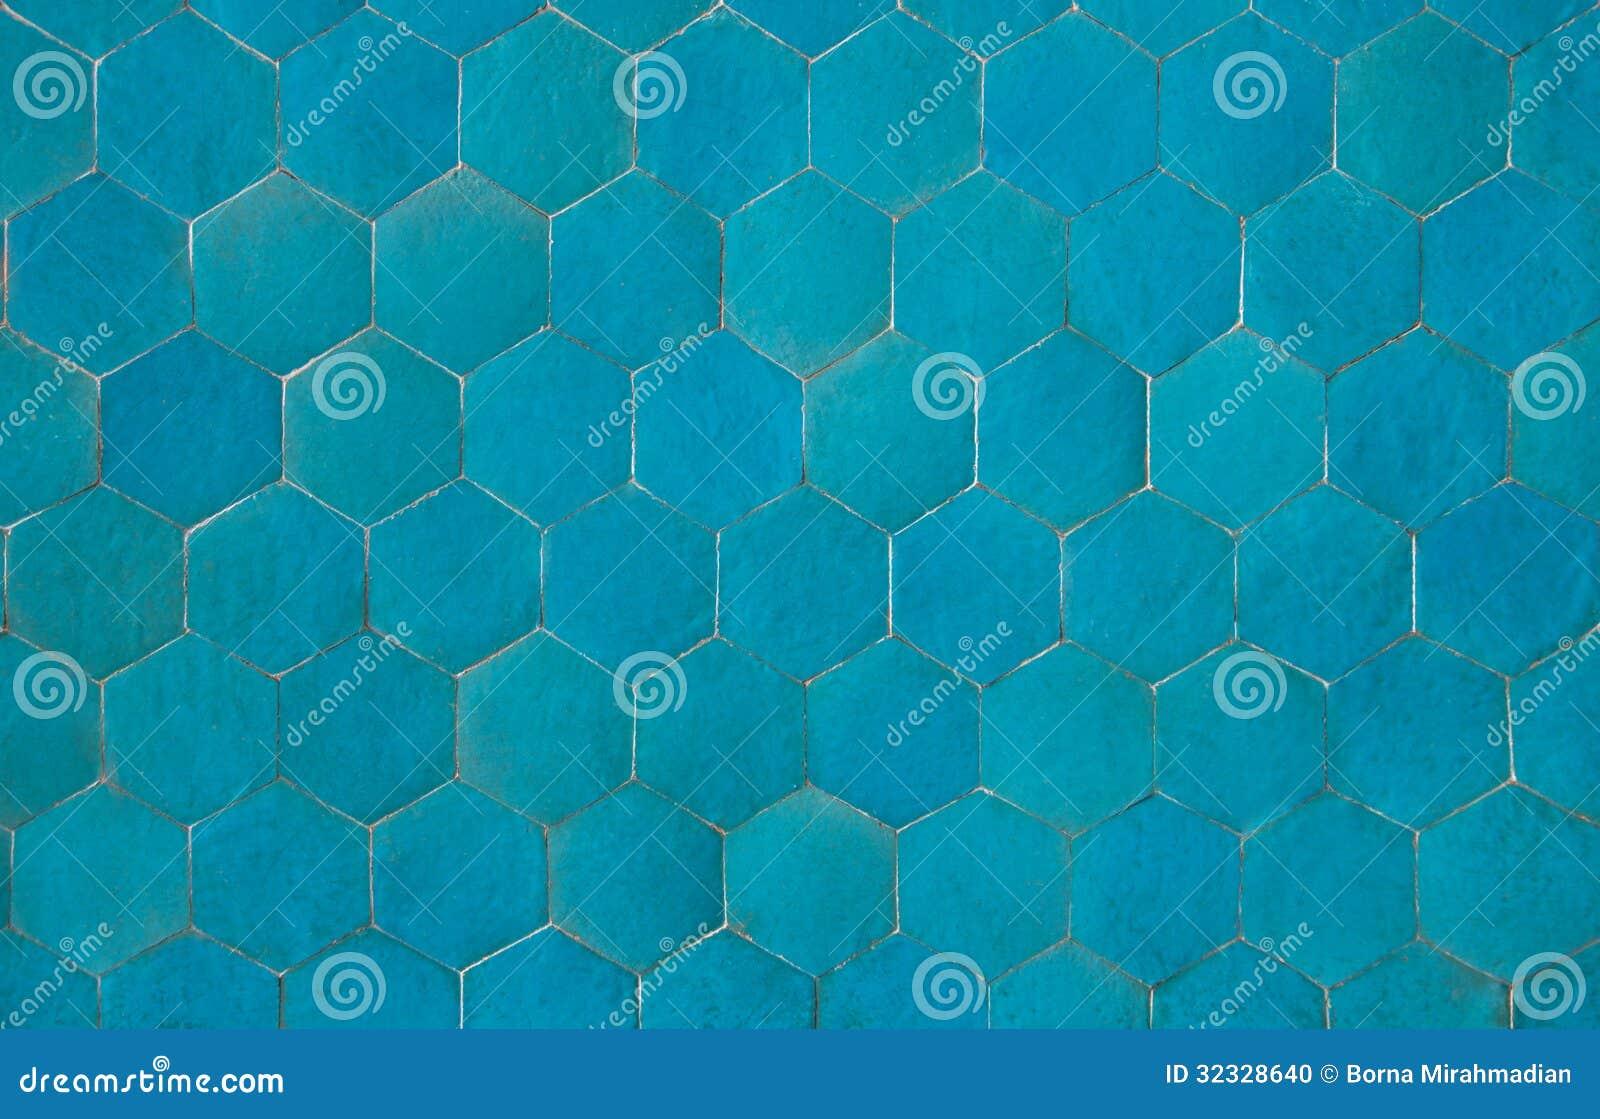 Background Of Hexagonal Blue Tiles Stock Photo Image